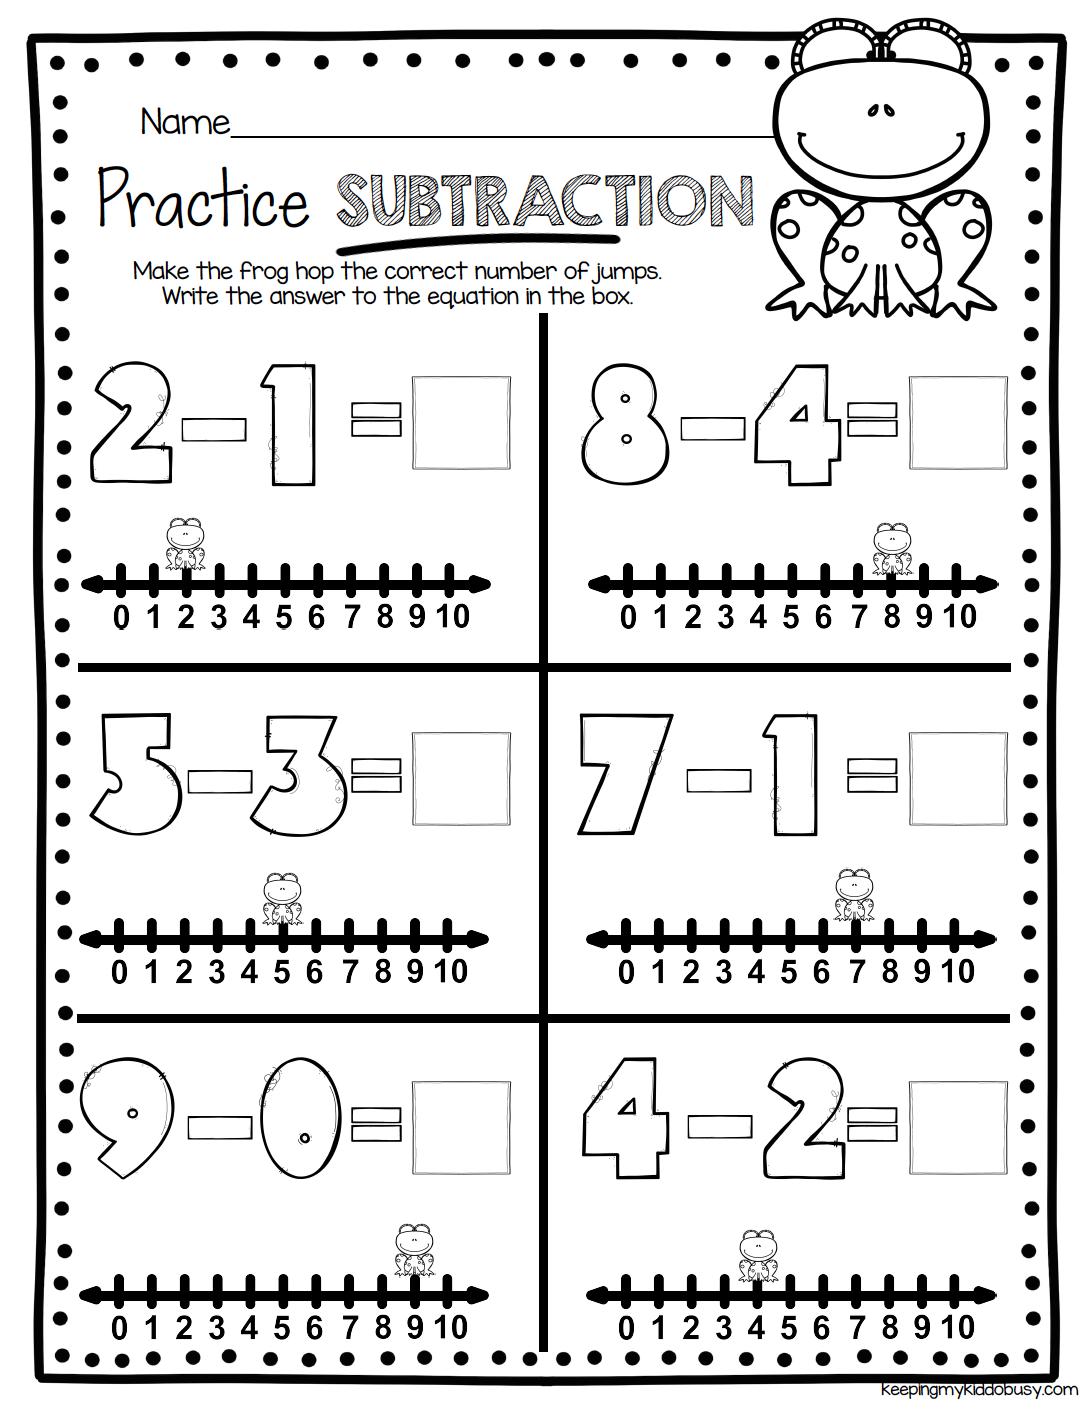 Algebraic Thinking Worksheet